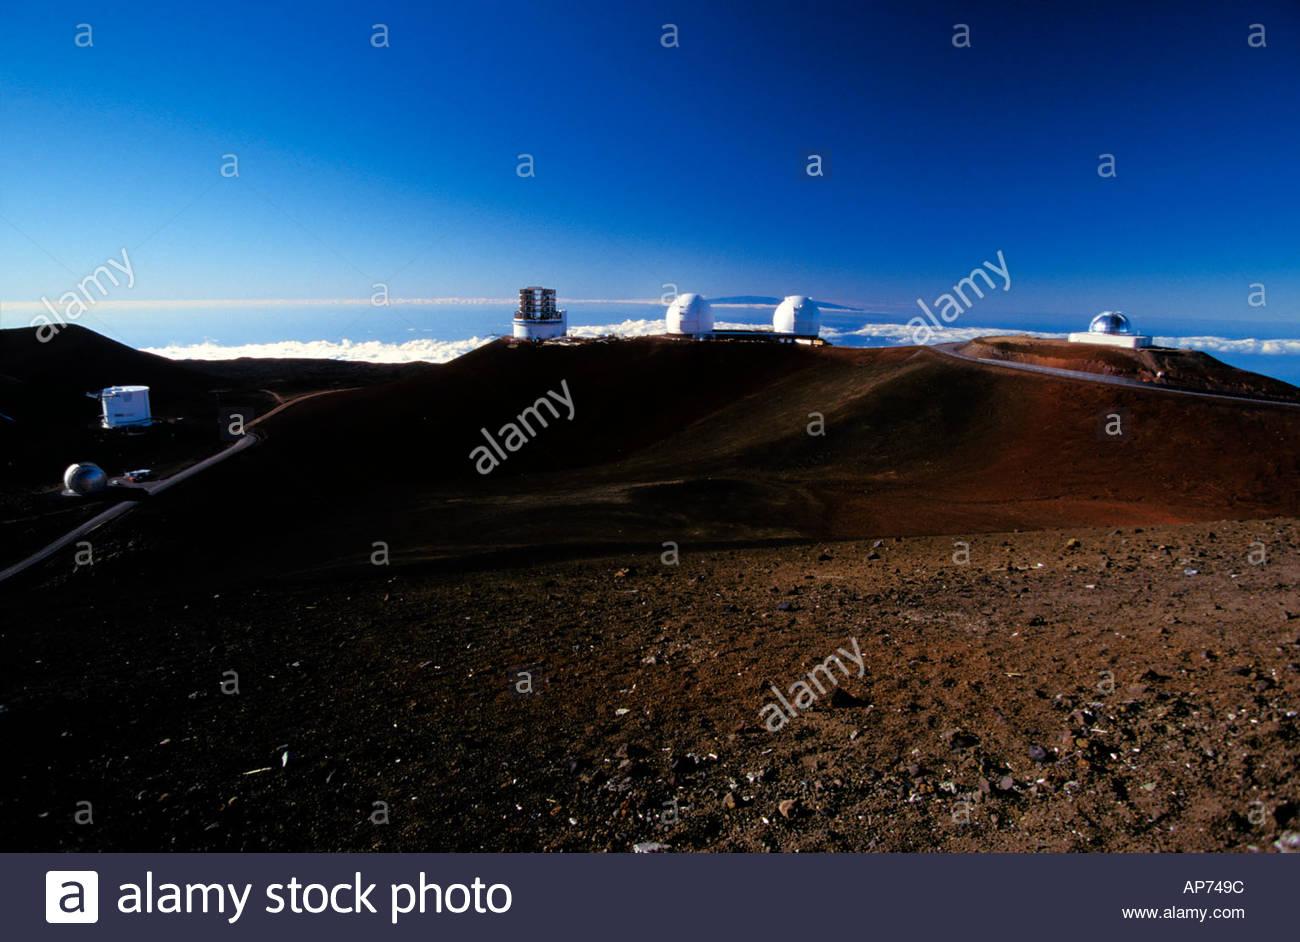 Sternwarte astronomie teleskopoptik spiegel objektiv wissenschaft